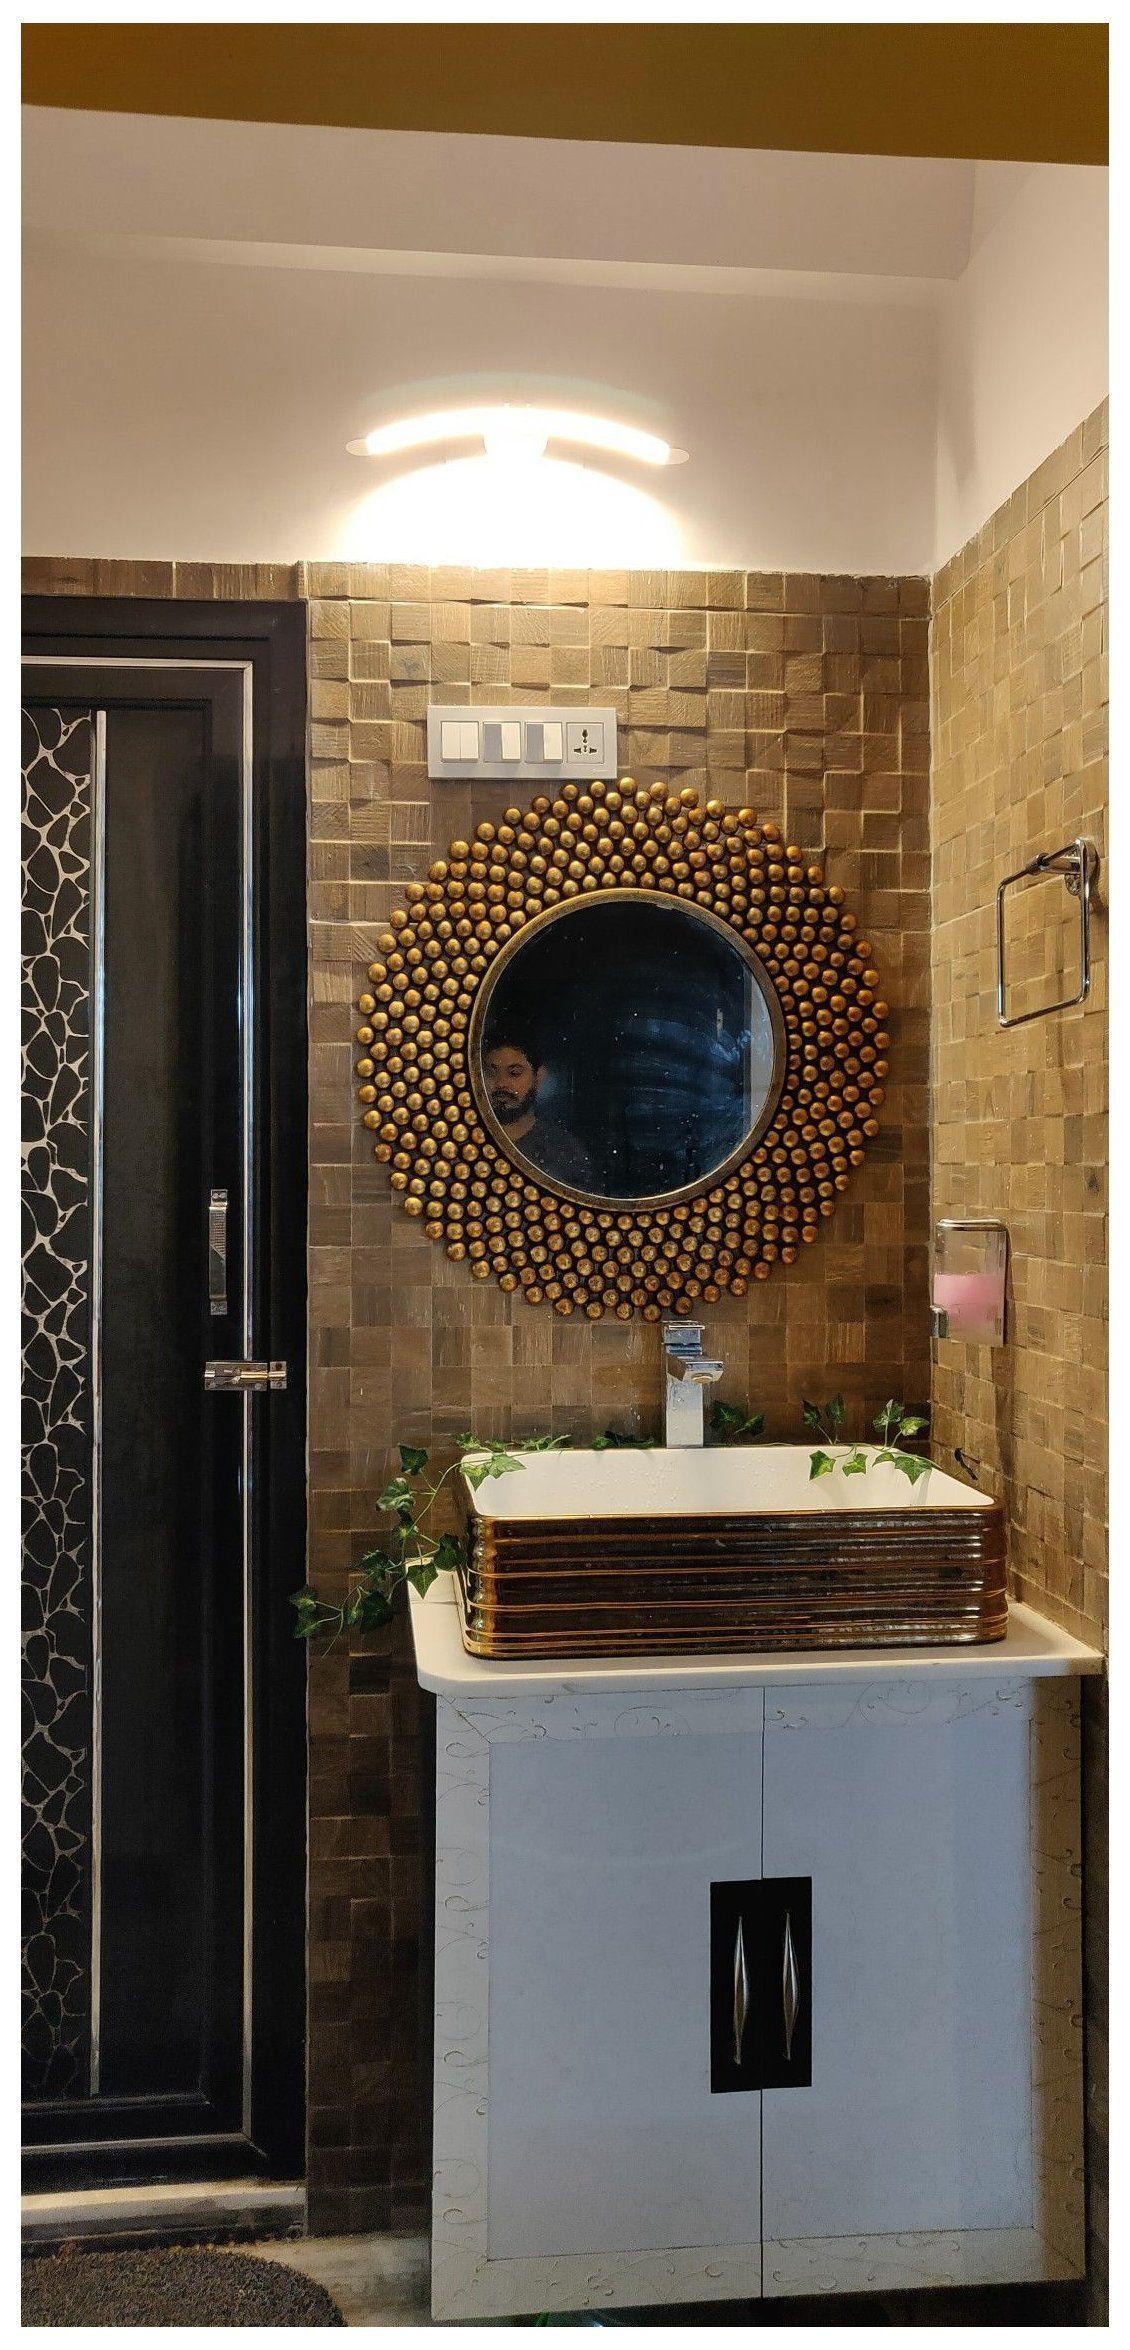 Washbasin Design Basin Wash, Wash Basin In Dining Room India